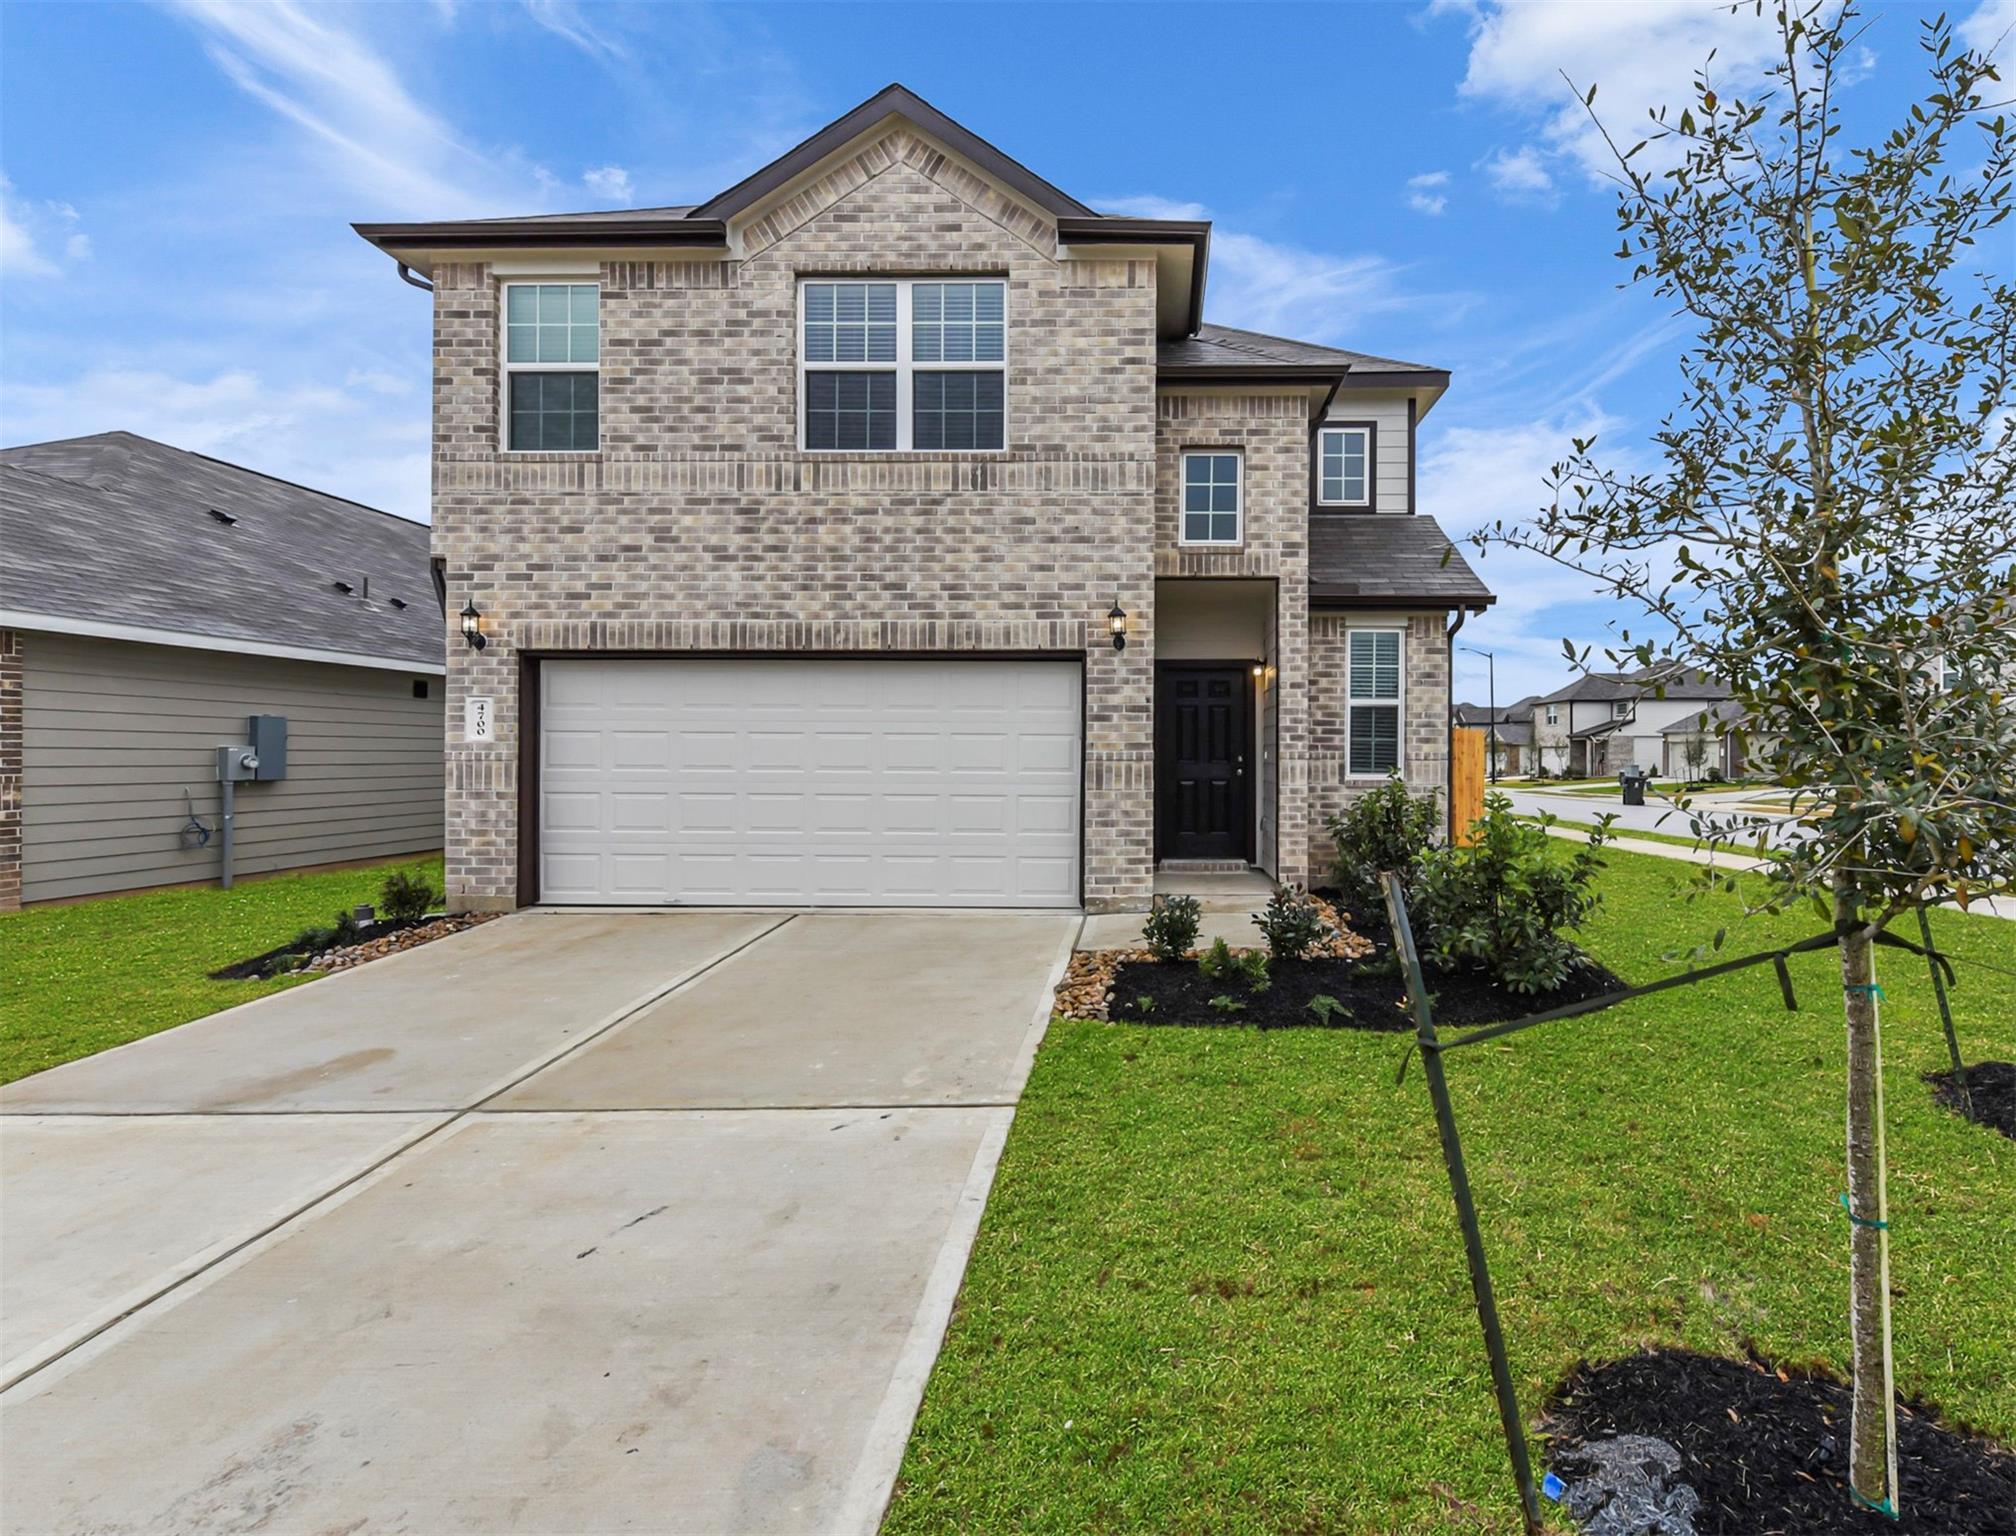 4700 Coyotillo Way Property Photo - Bryan, TX real estate listing